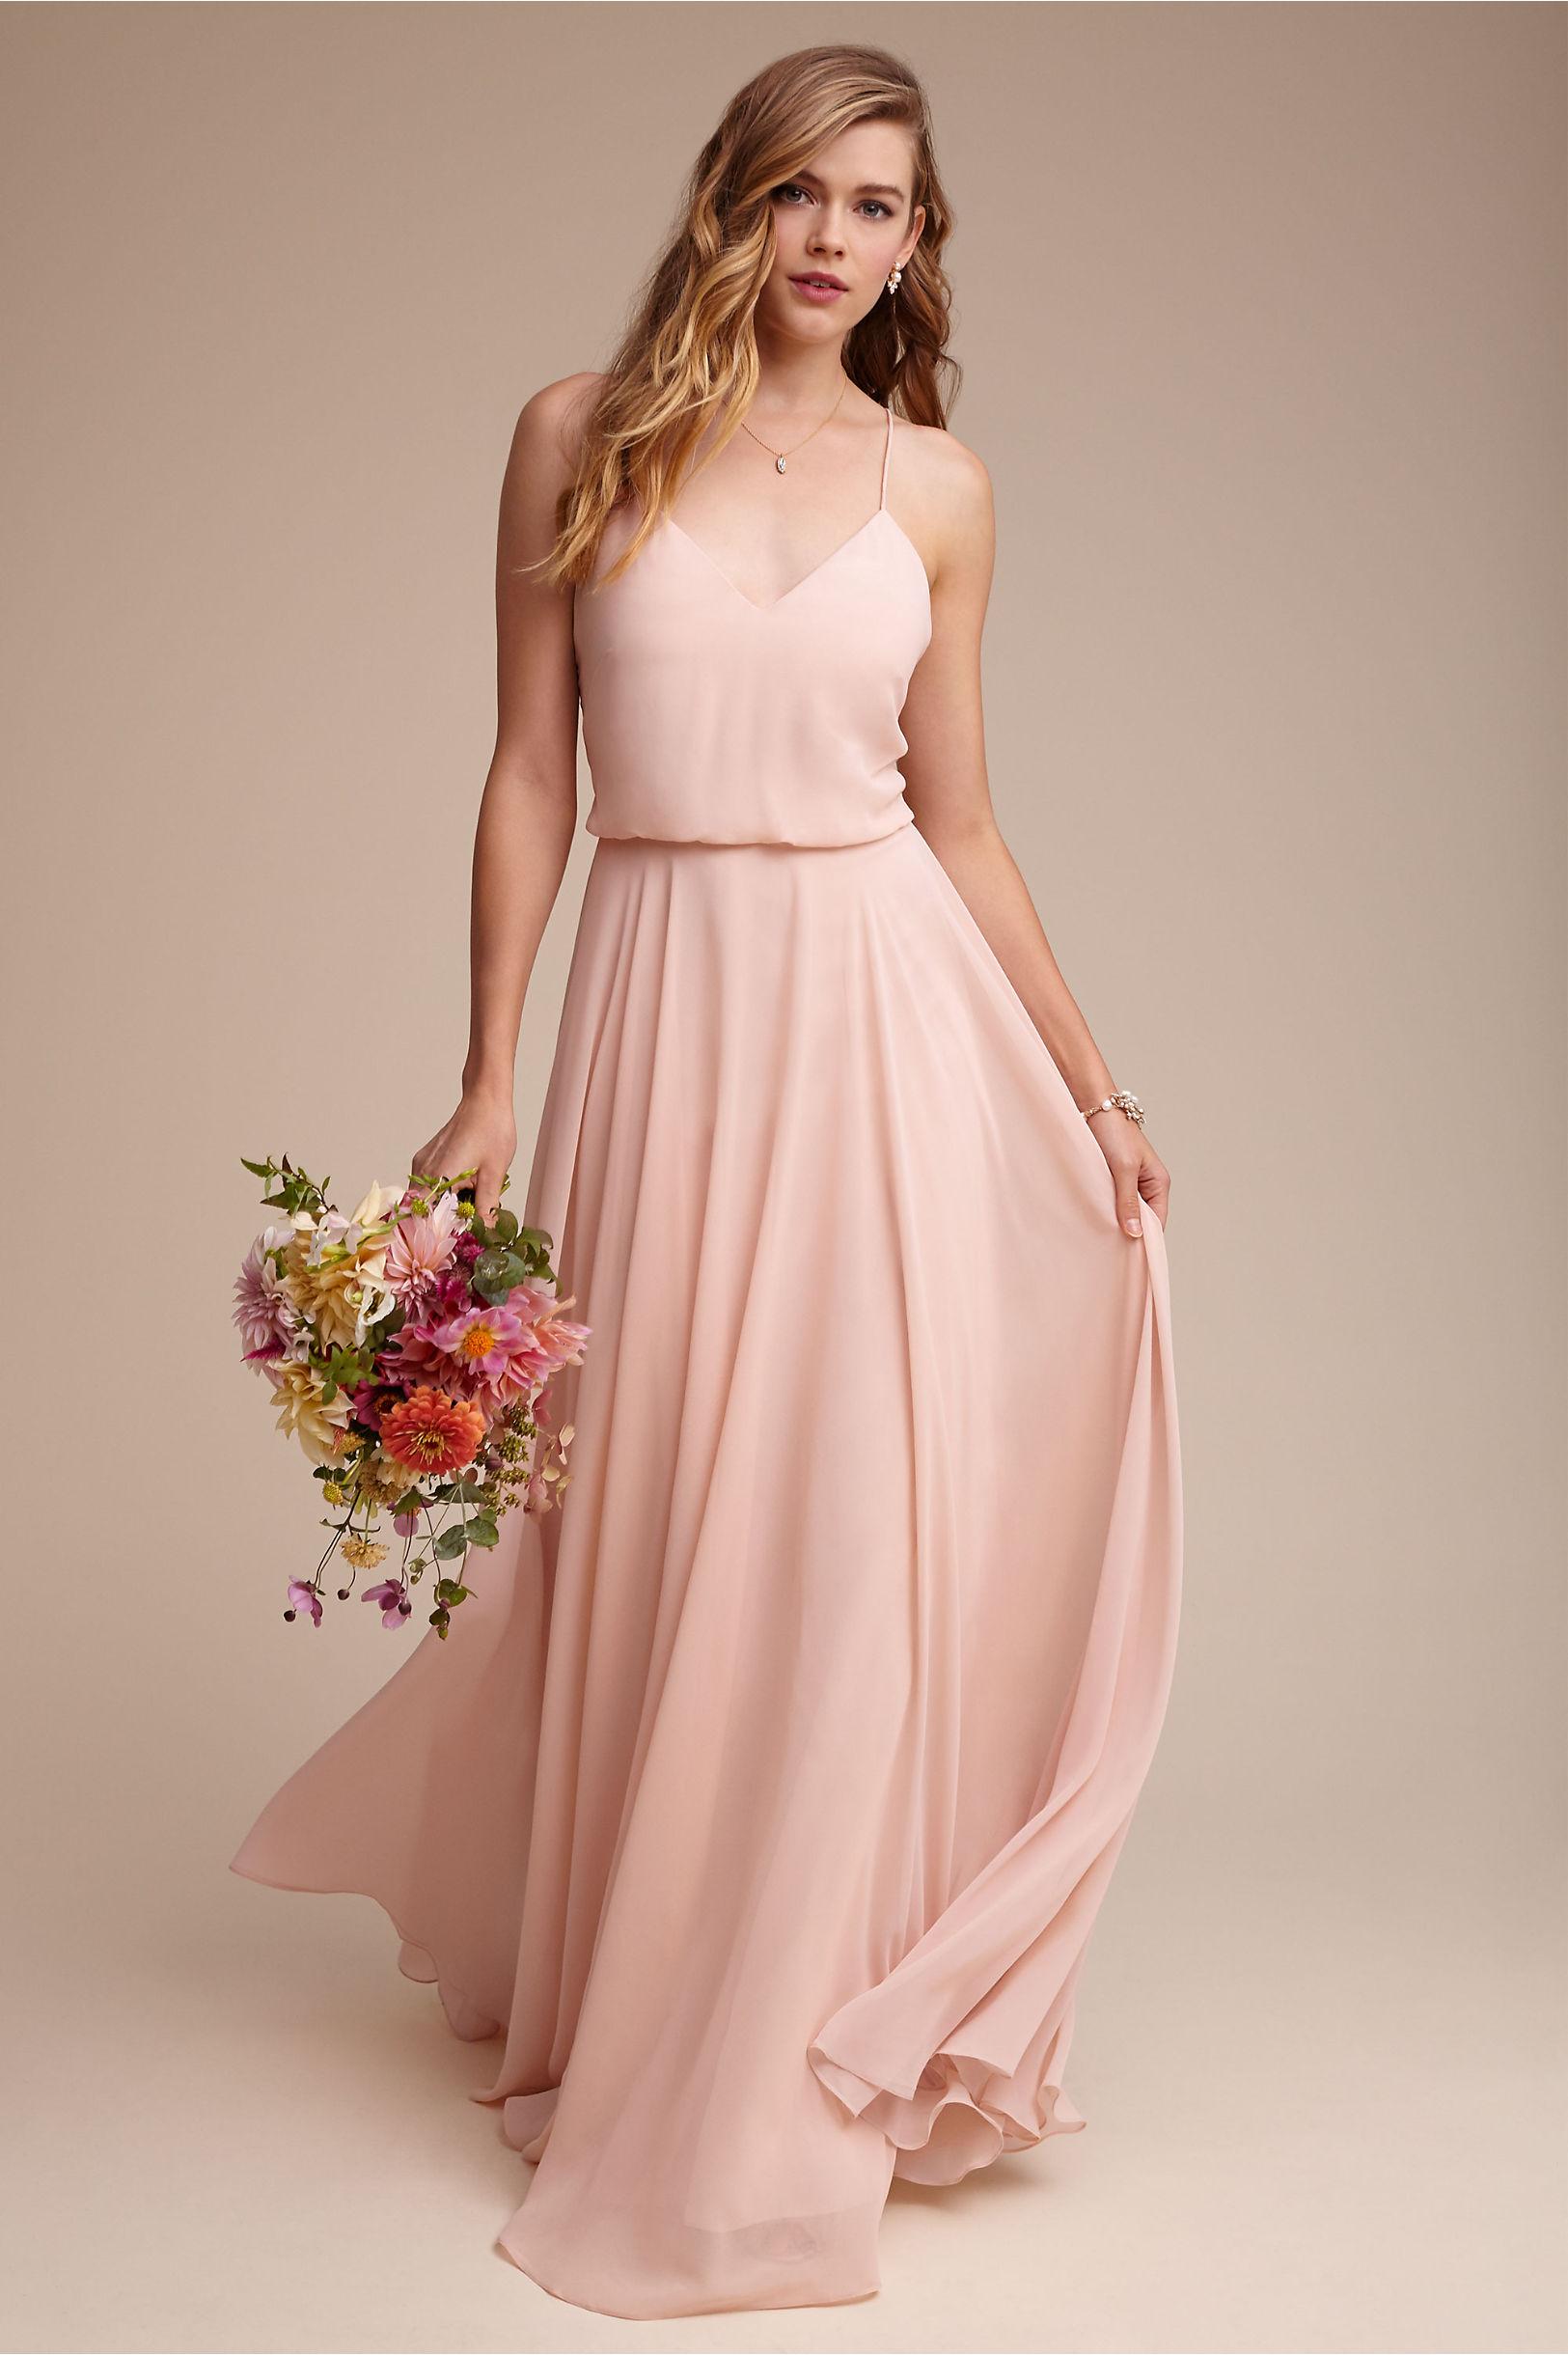 Inesse Dress Cinnamon Rose in Bridal Party | BHLDN